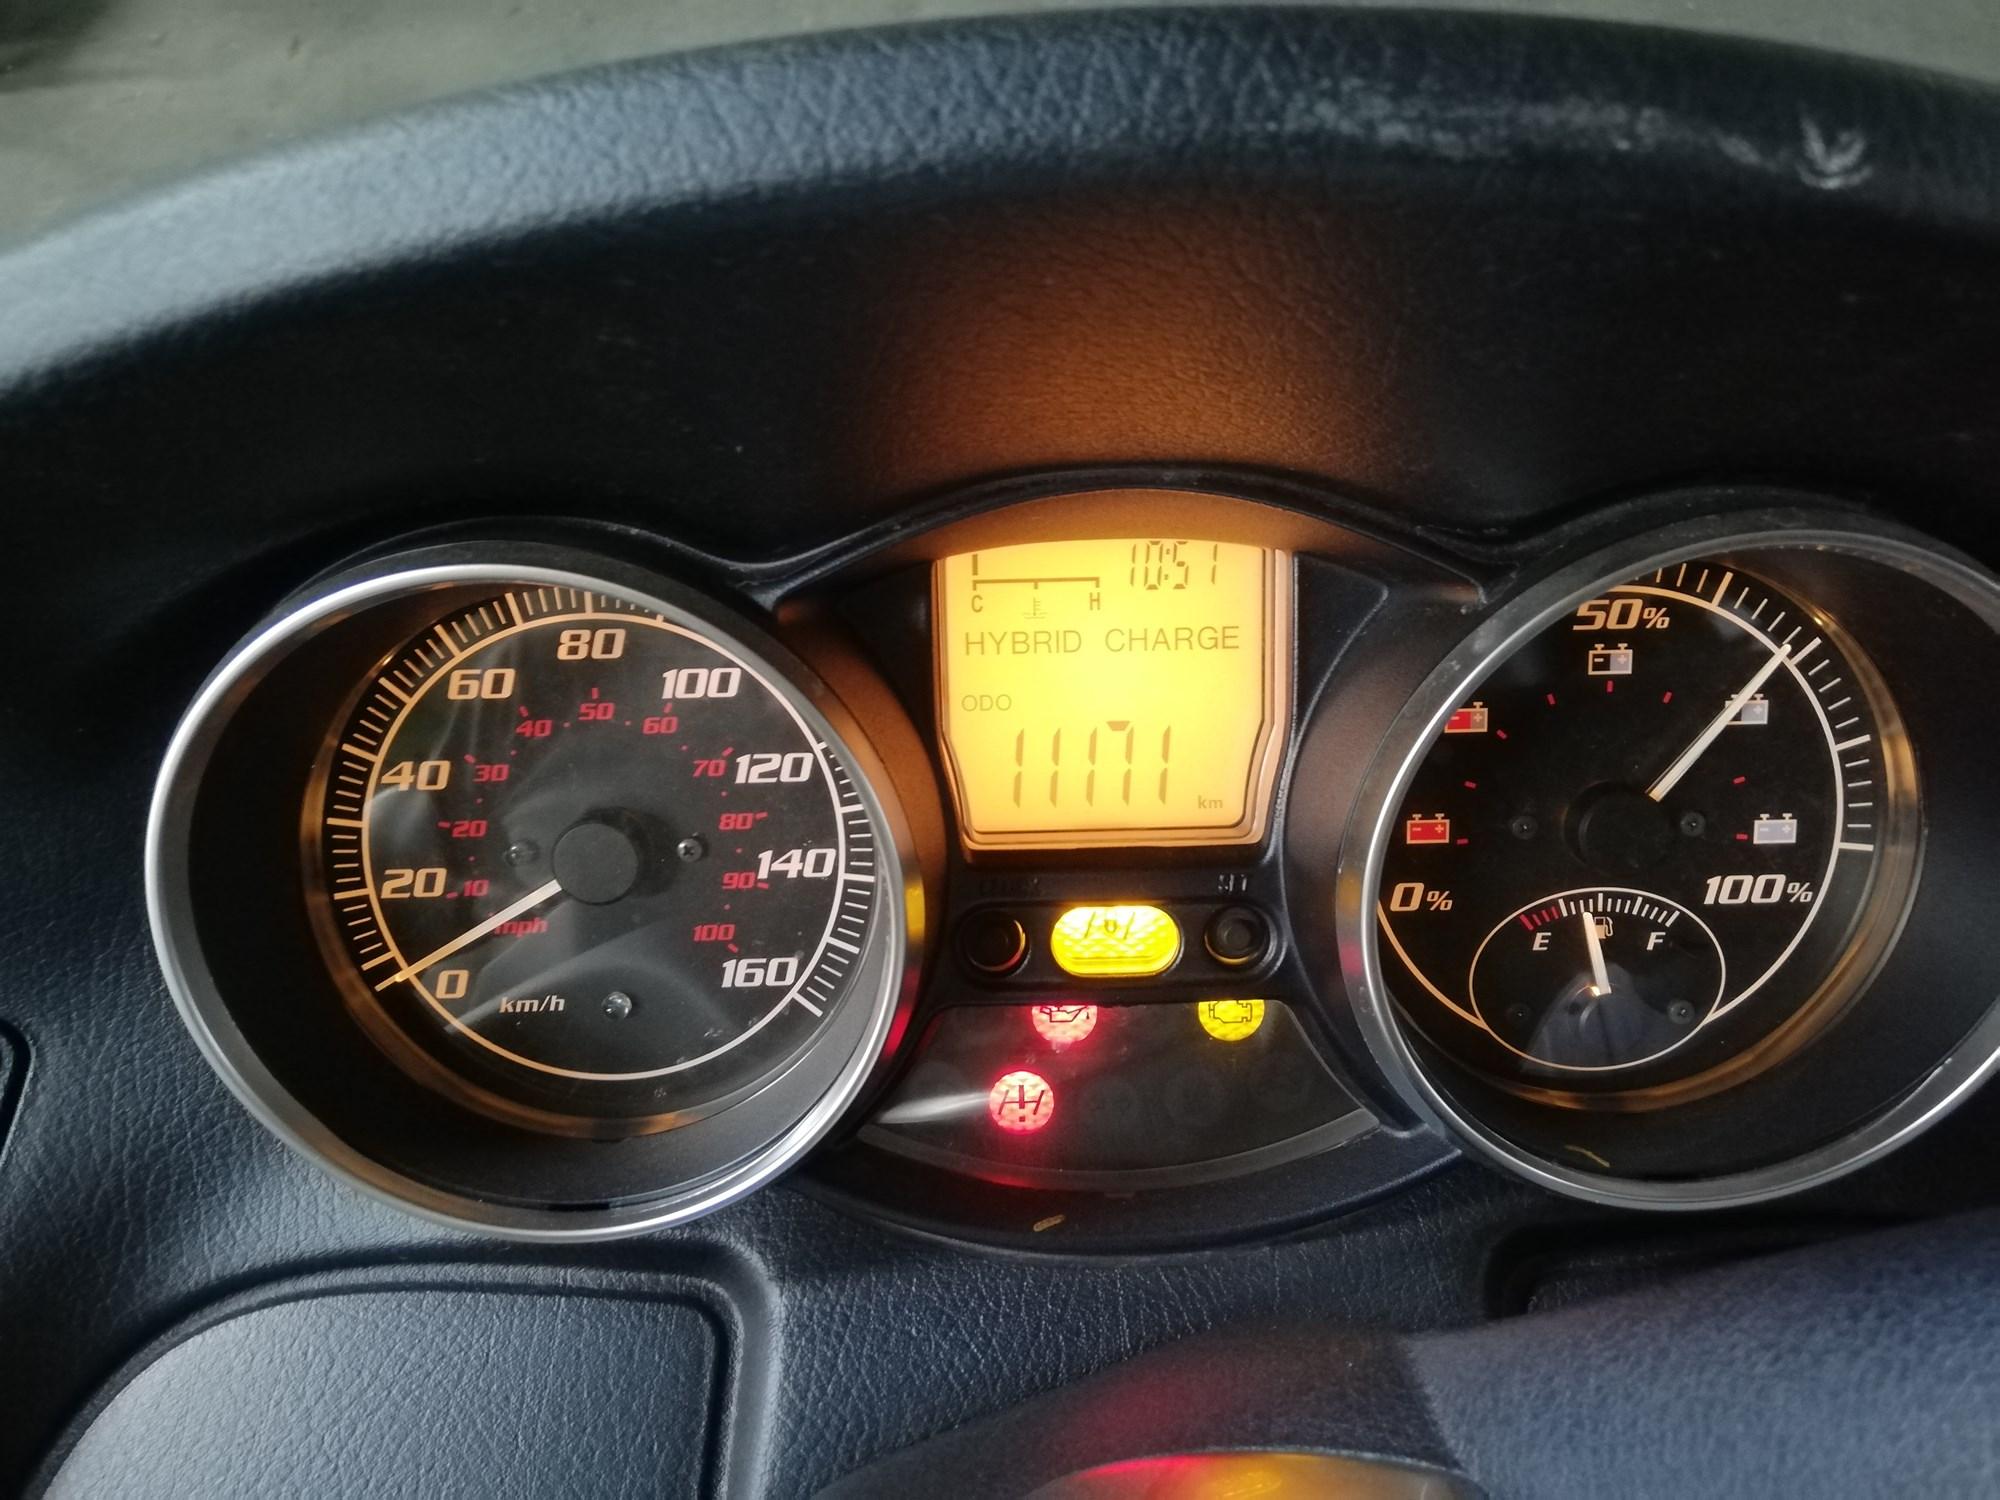 PIAGGIO MP3 Hybrid , csupán 11171km-el, 4. kép